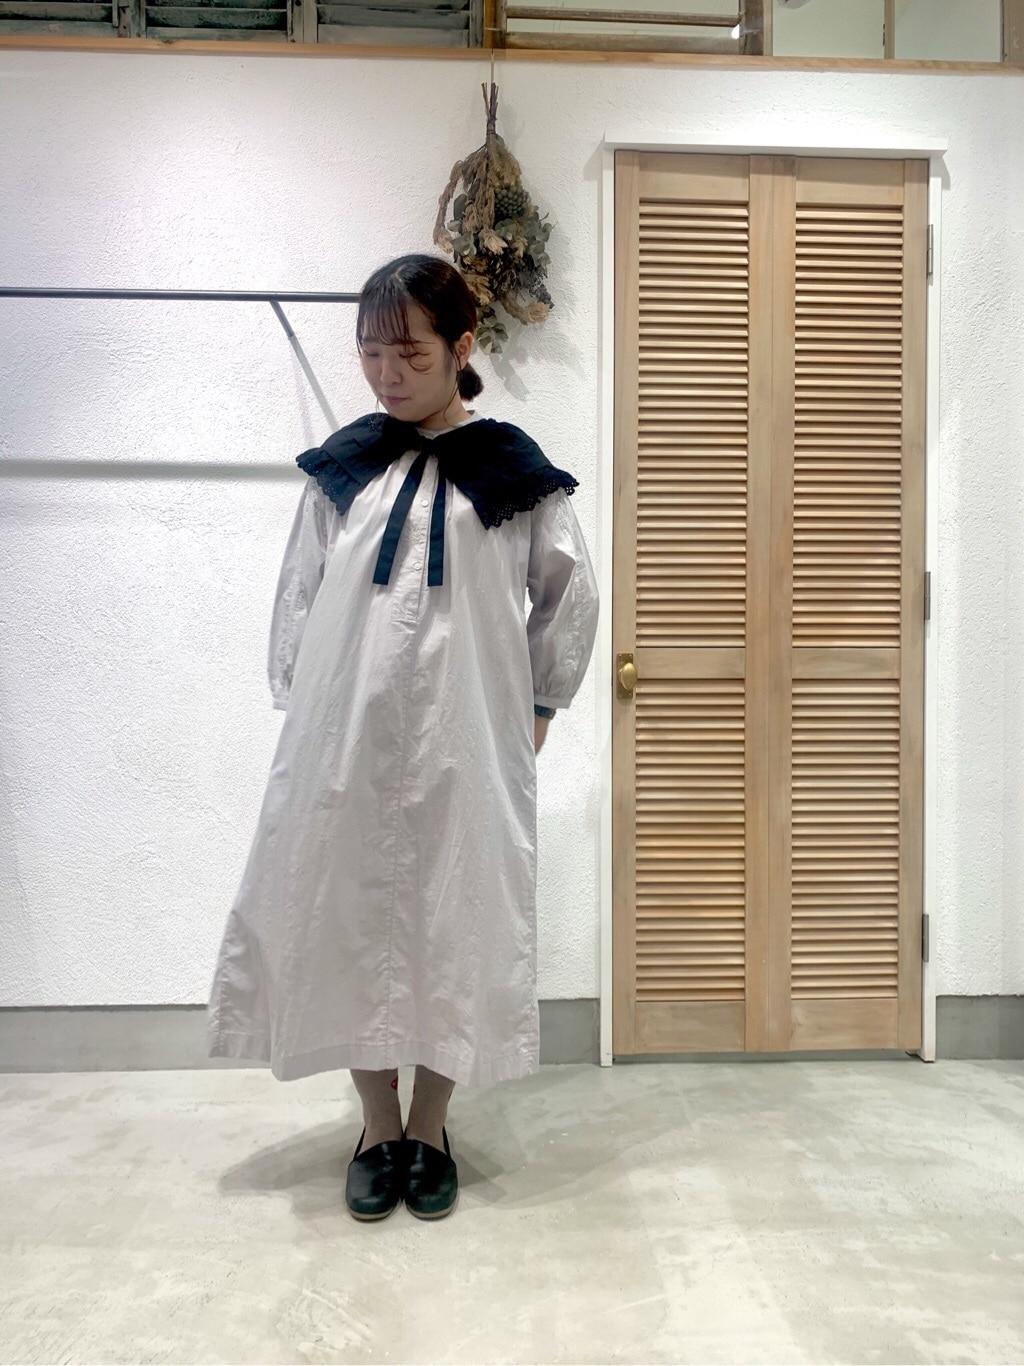 chambre de charme 横浜ジョイナス 身長:155cm 2020.07.21